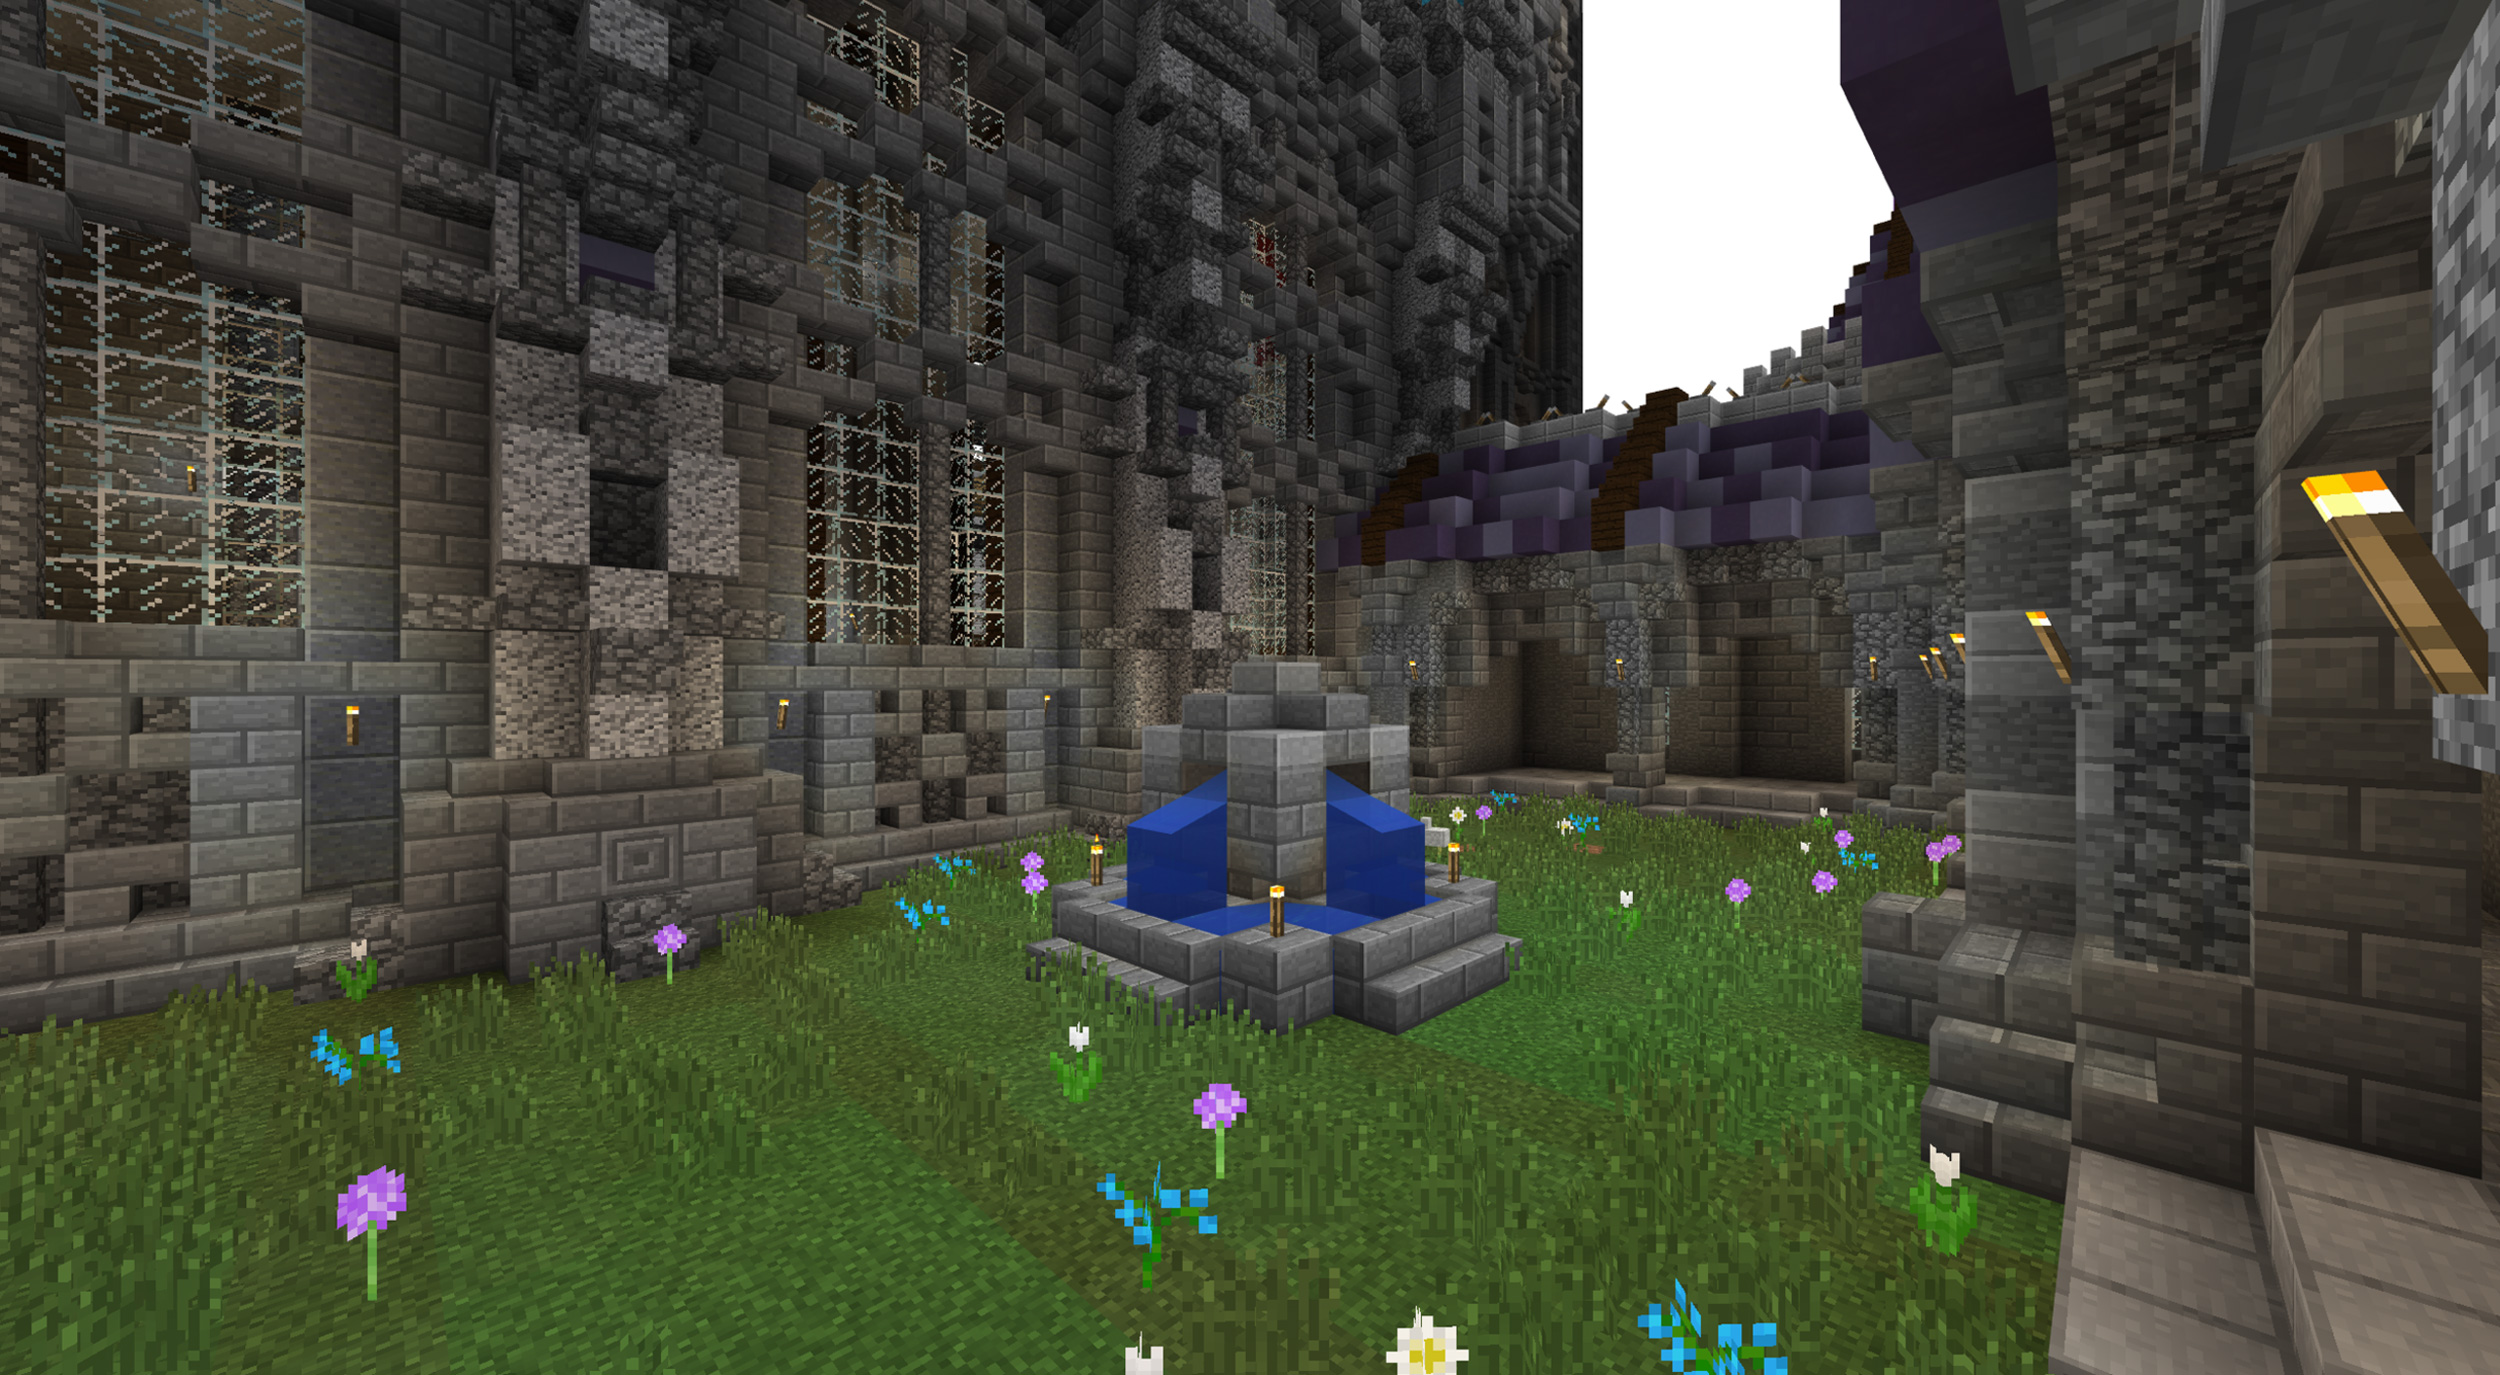 Minecraft_+Windows+10+Edition+15_08_2017+17_39_49.jpg